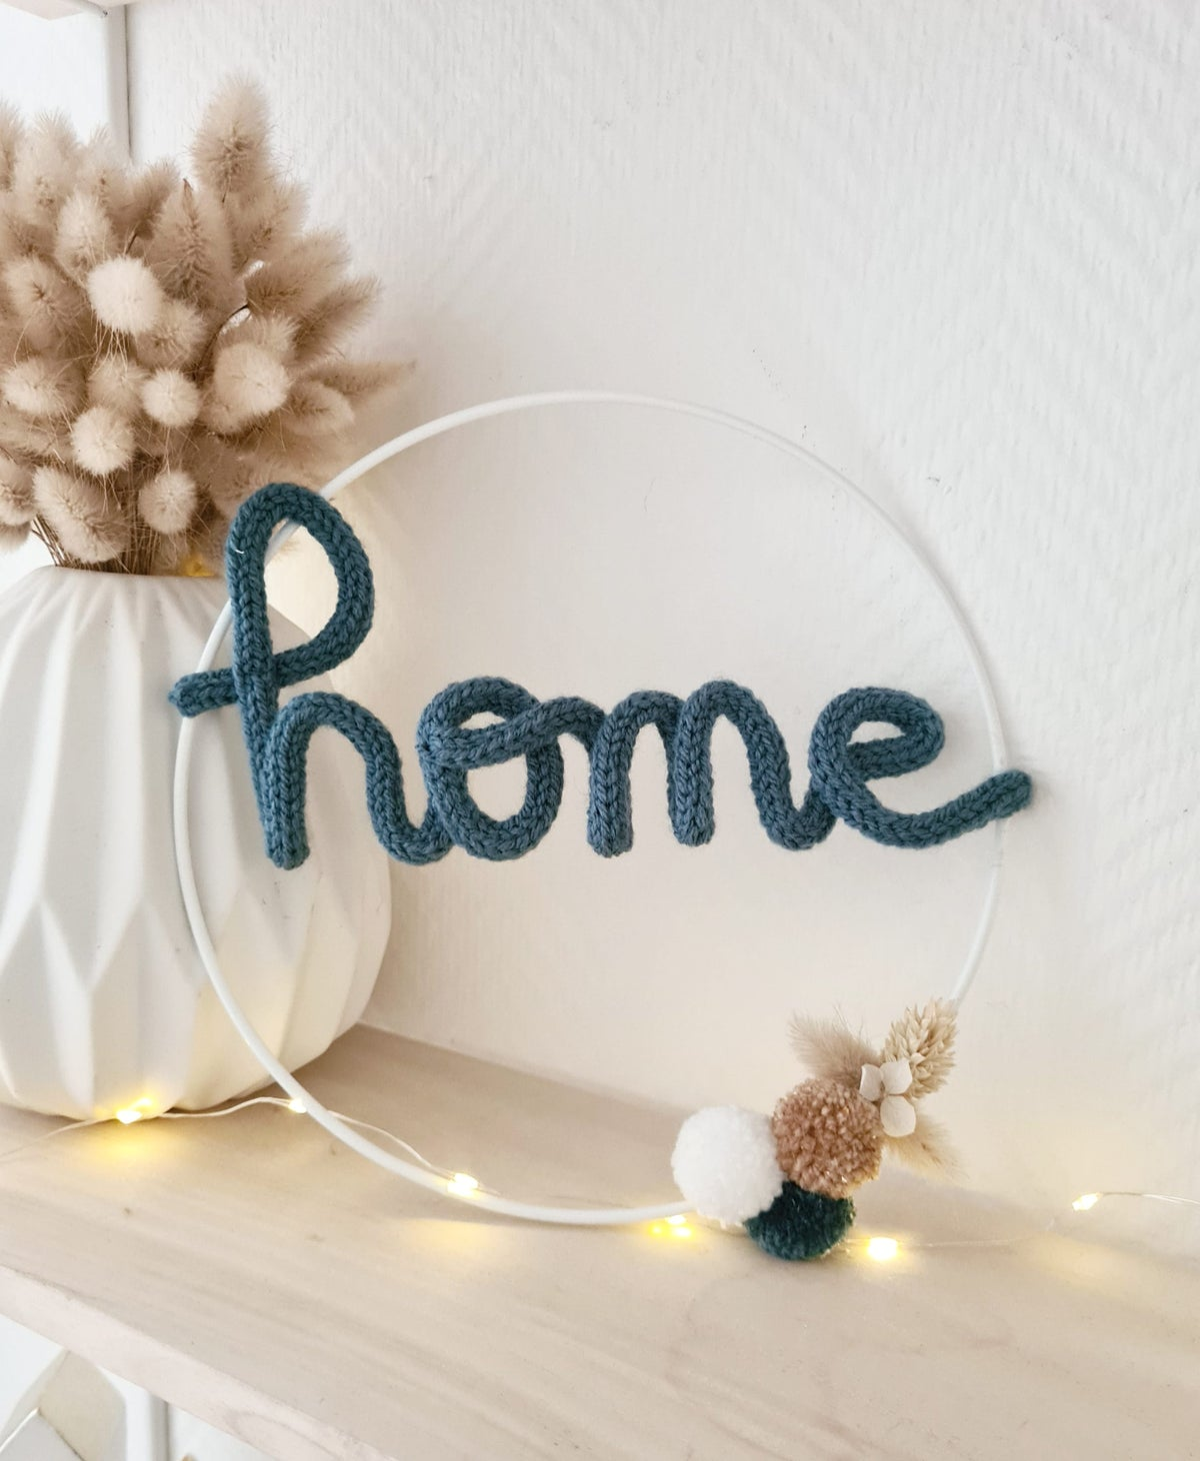 Image of Home - cercle métal